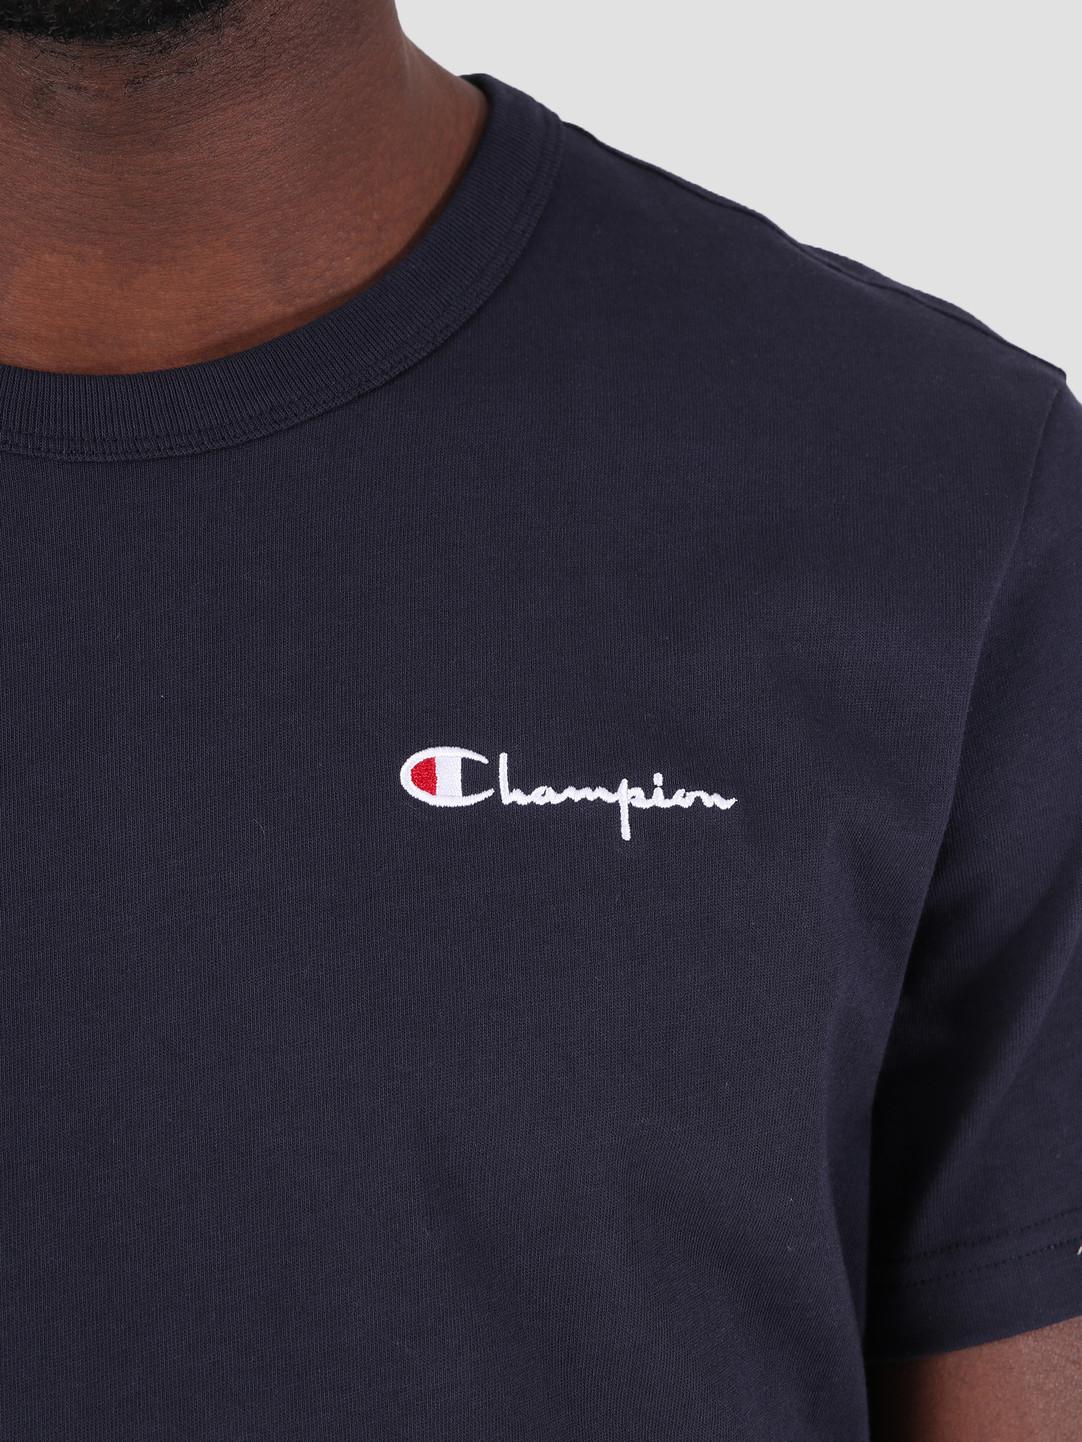 Champion Champion Crewneck T-Shirt NNY 211985